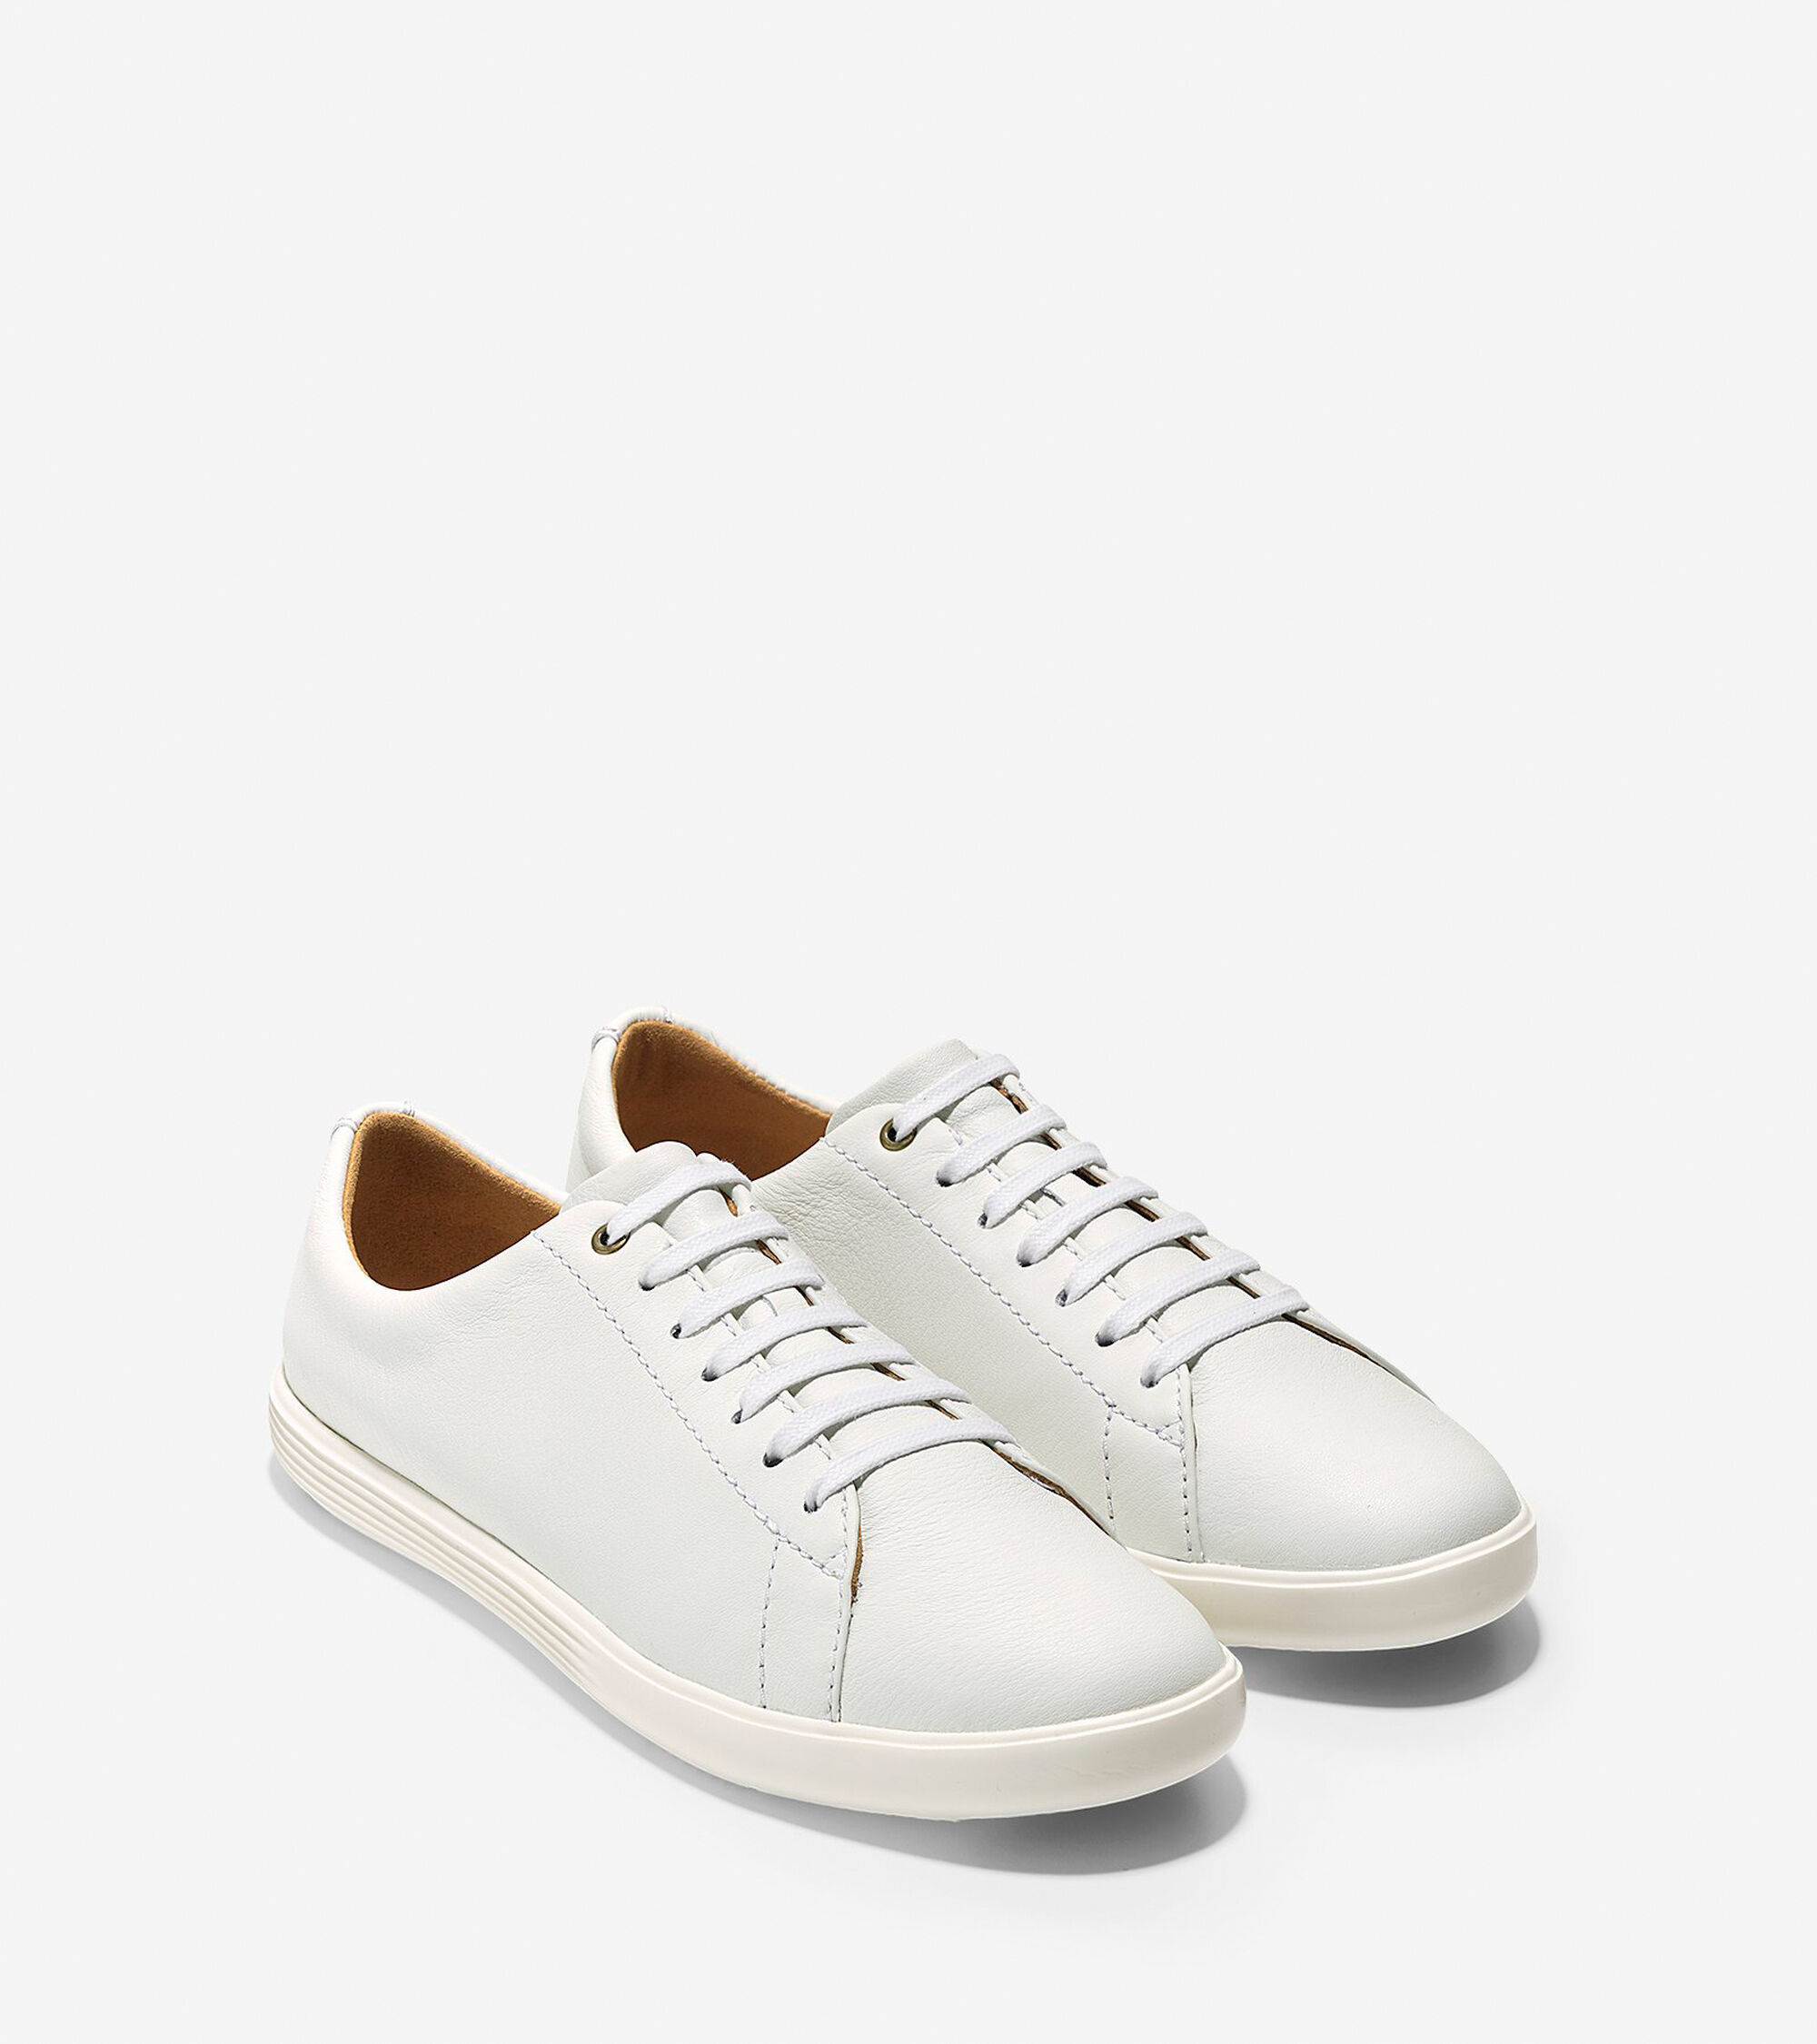 33c5f0e3c58 Women's Grand Crosscourt Sneakers in Bright White | Cole Haan